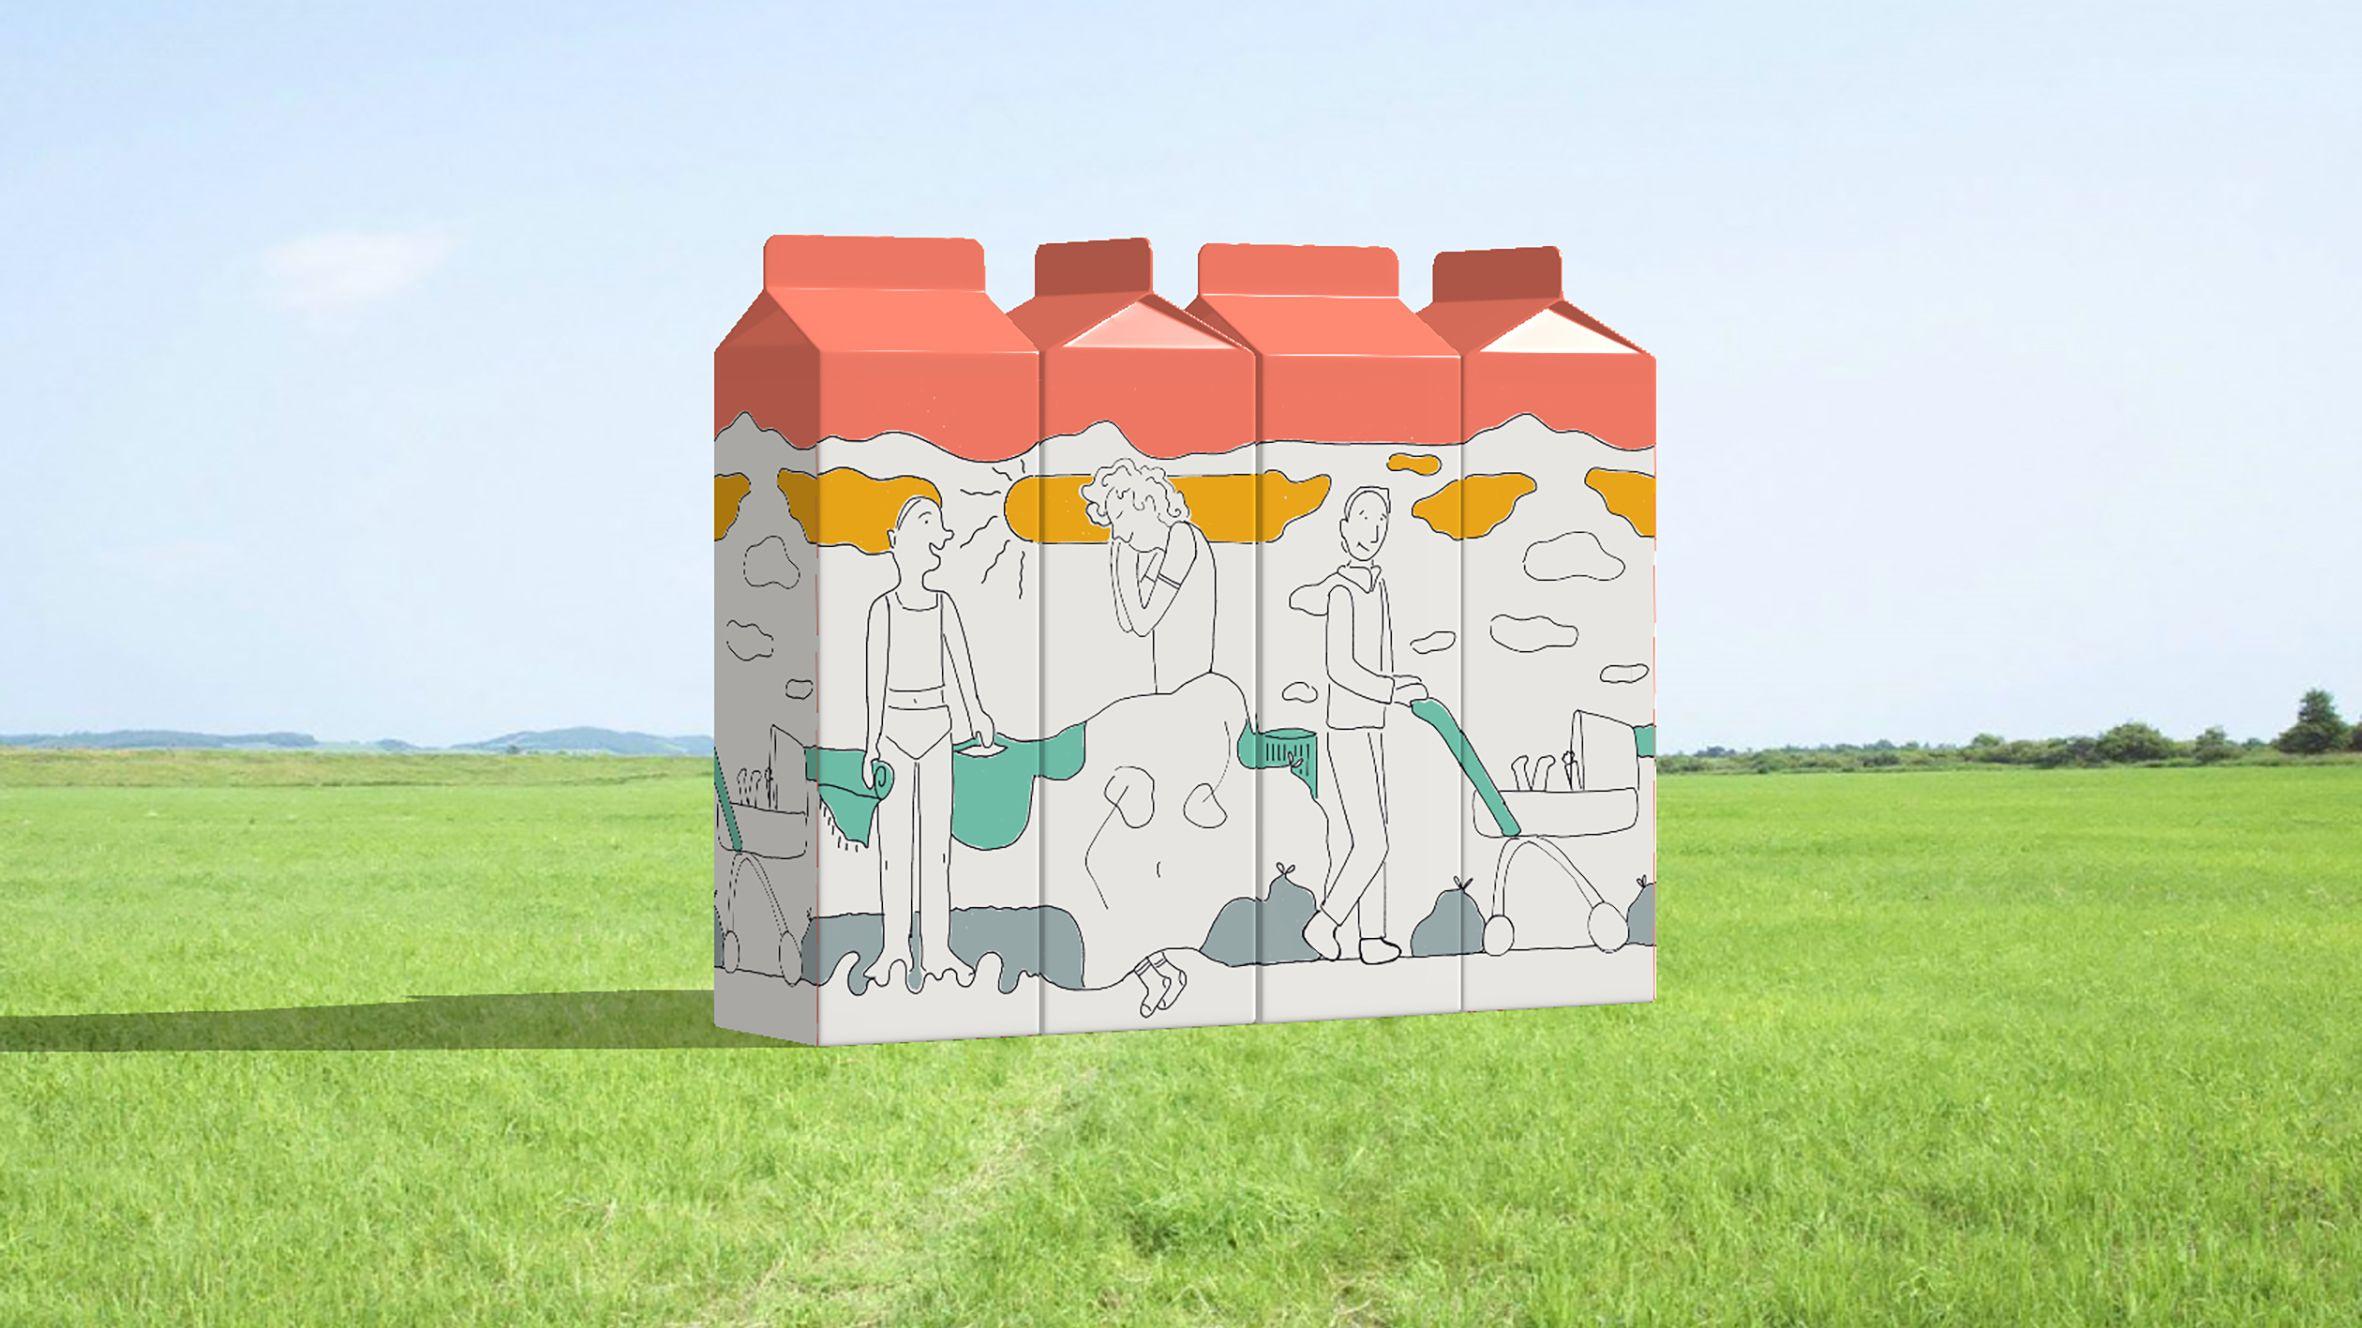 Four cartons of milk aligned to make a composite image